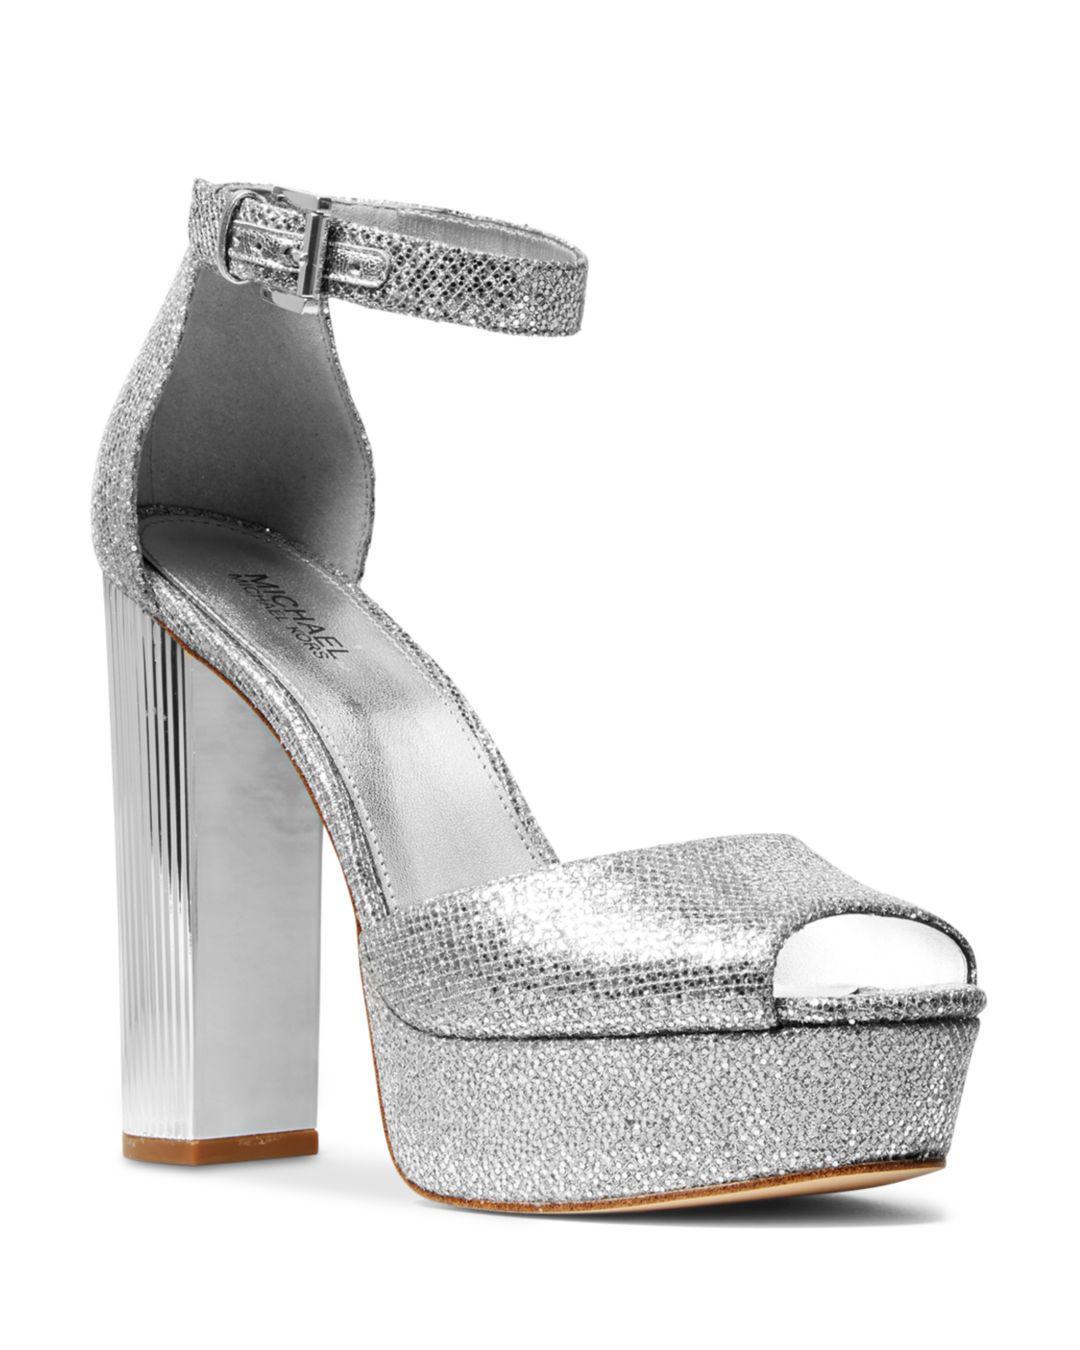 e4dd1c85a26a Lyst - MICHAEL Michael Kors Women s Paloma Platform Sandals in Metallic